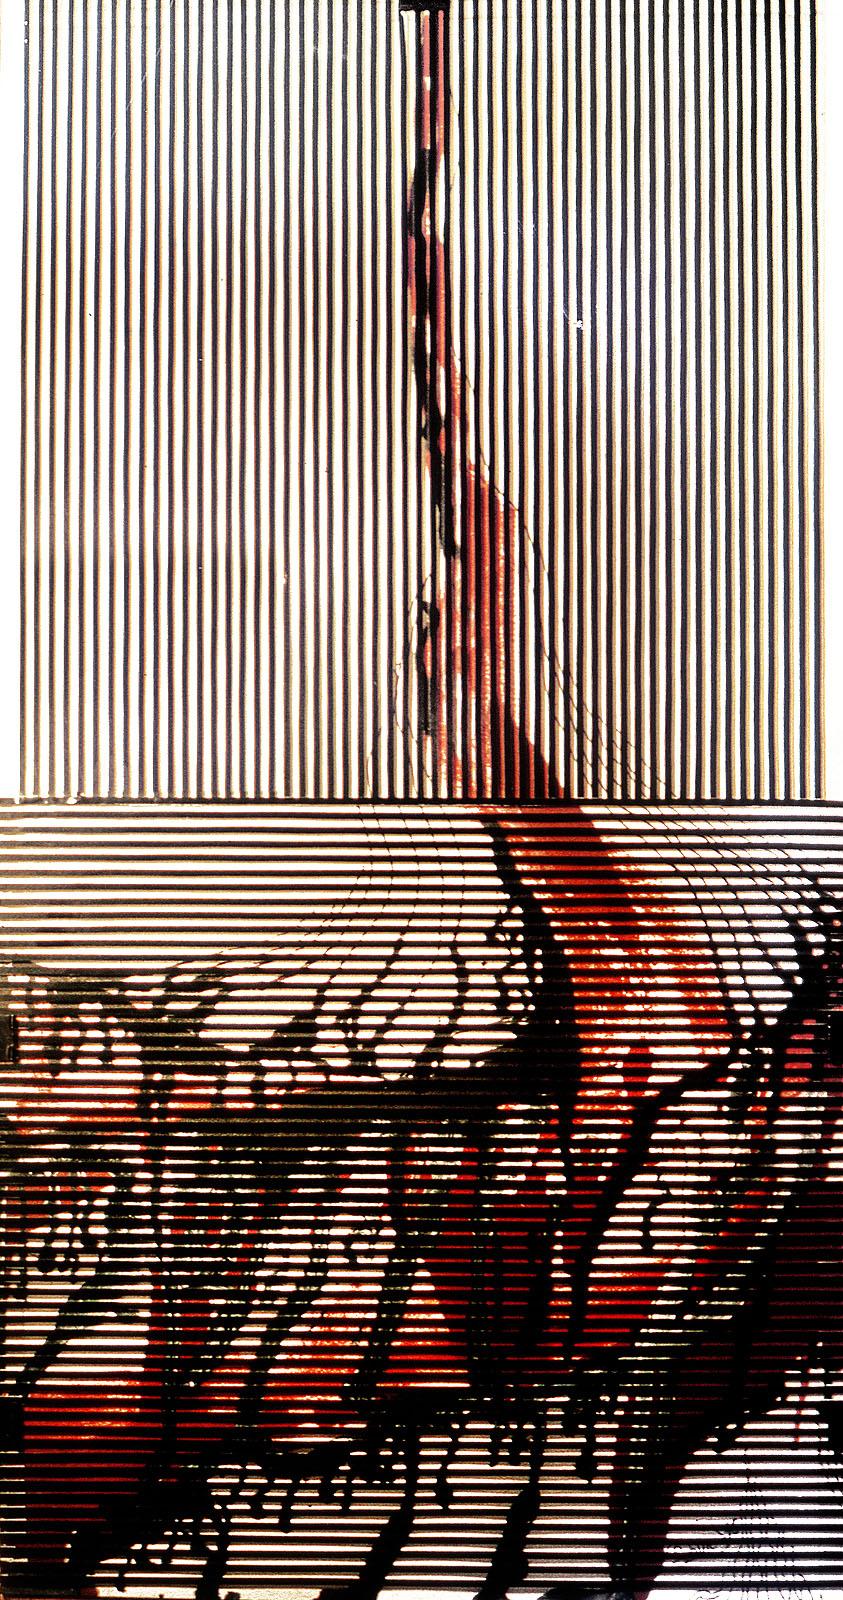 panies-danielvillalobos-spanish-painting-abstractexpressionism-10